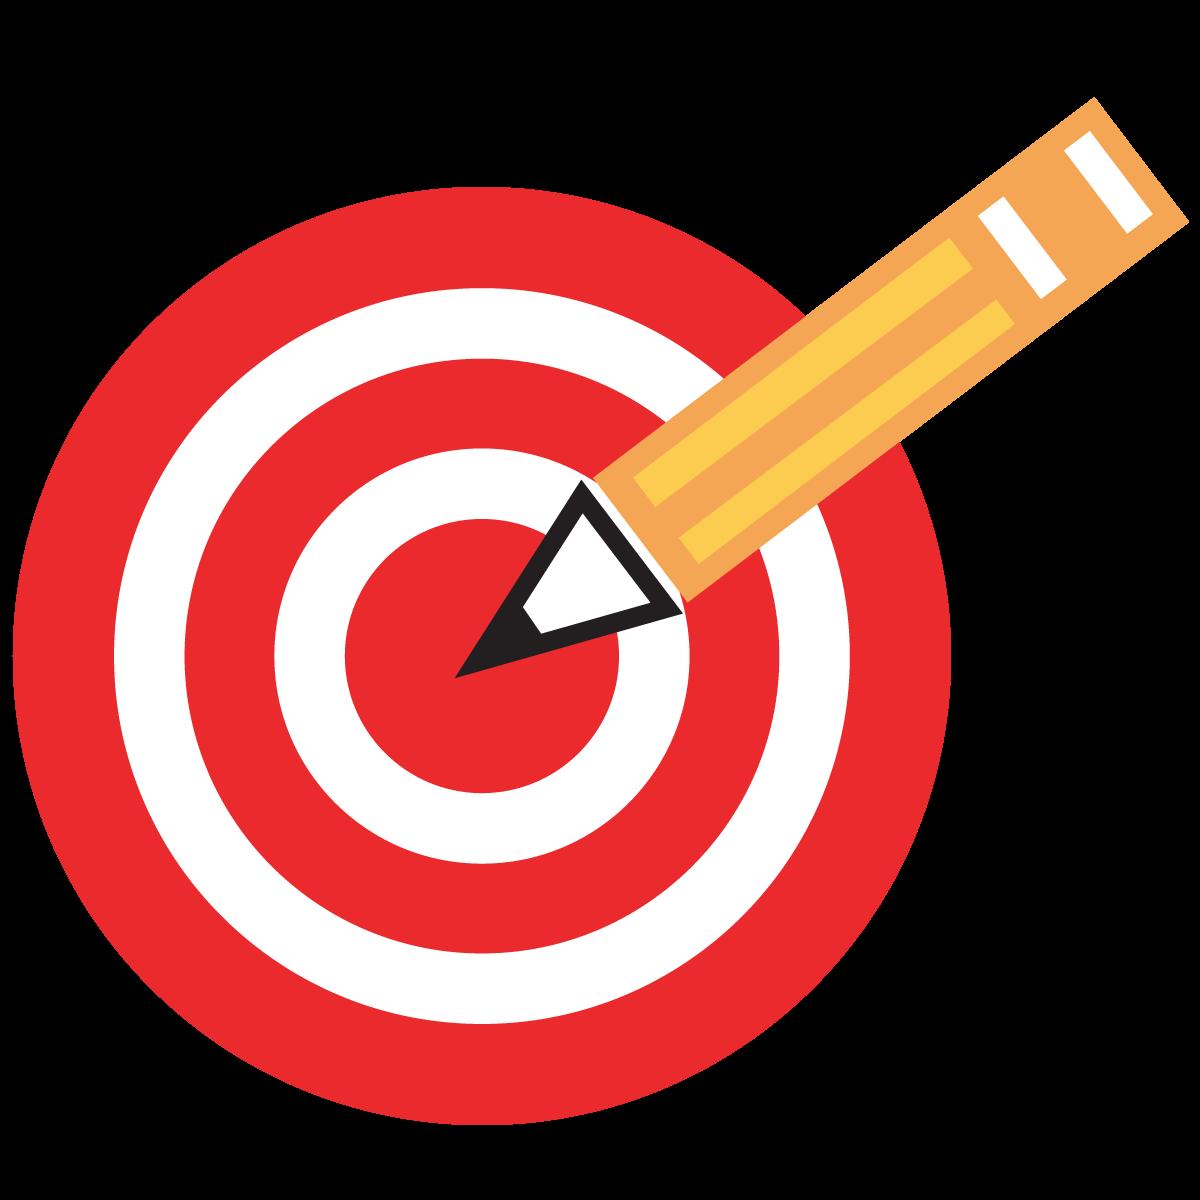 clip art target bullseye - photo #39